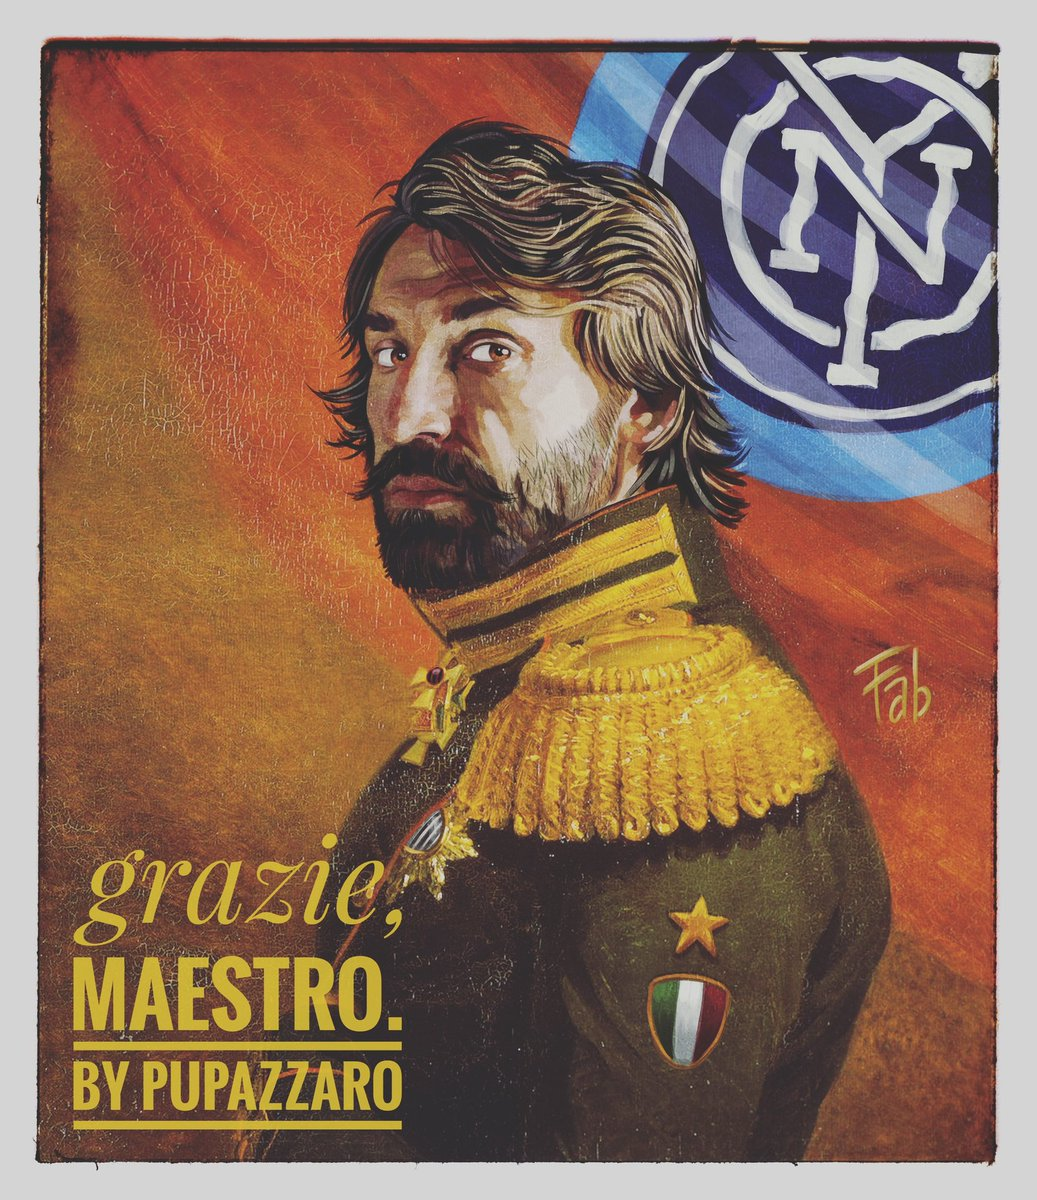 thanks Maestro. #pirlo #AndreaPirlo #professore https://t.co/d9N3jBgpU1